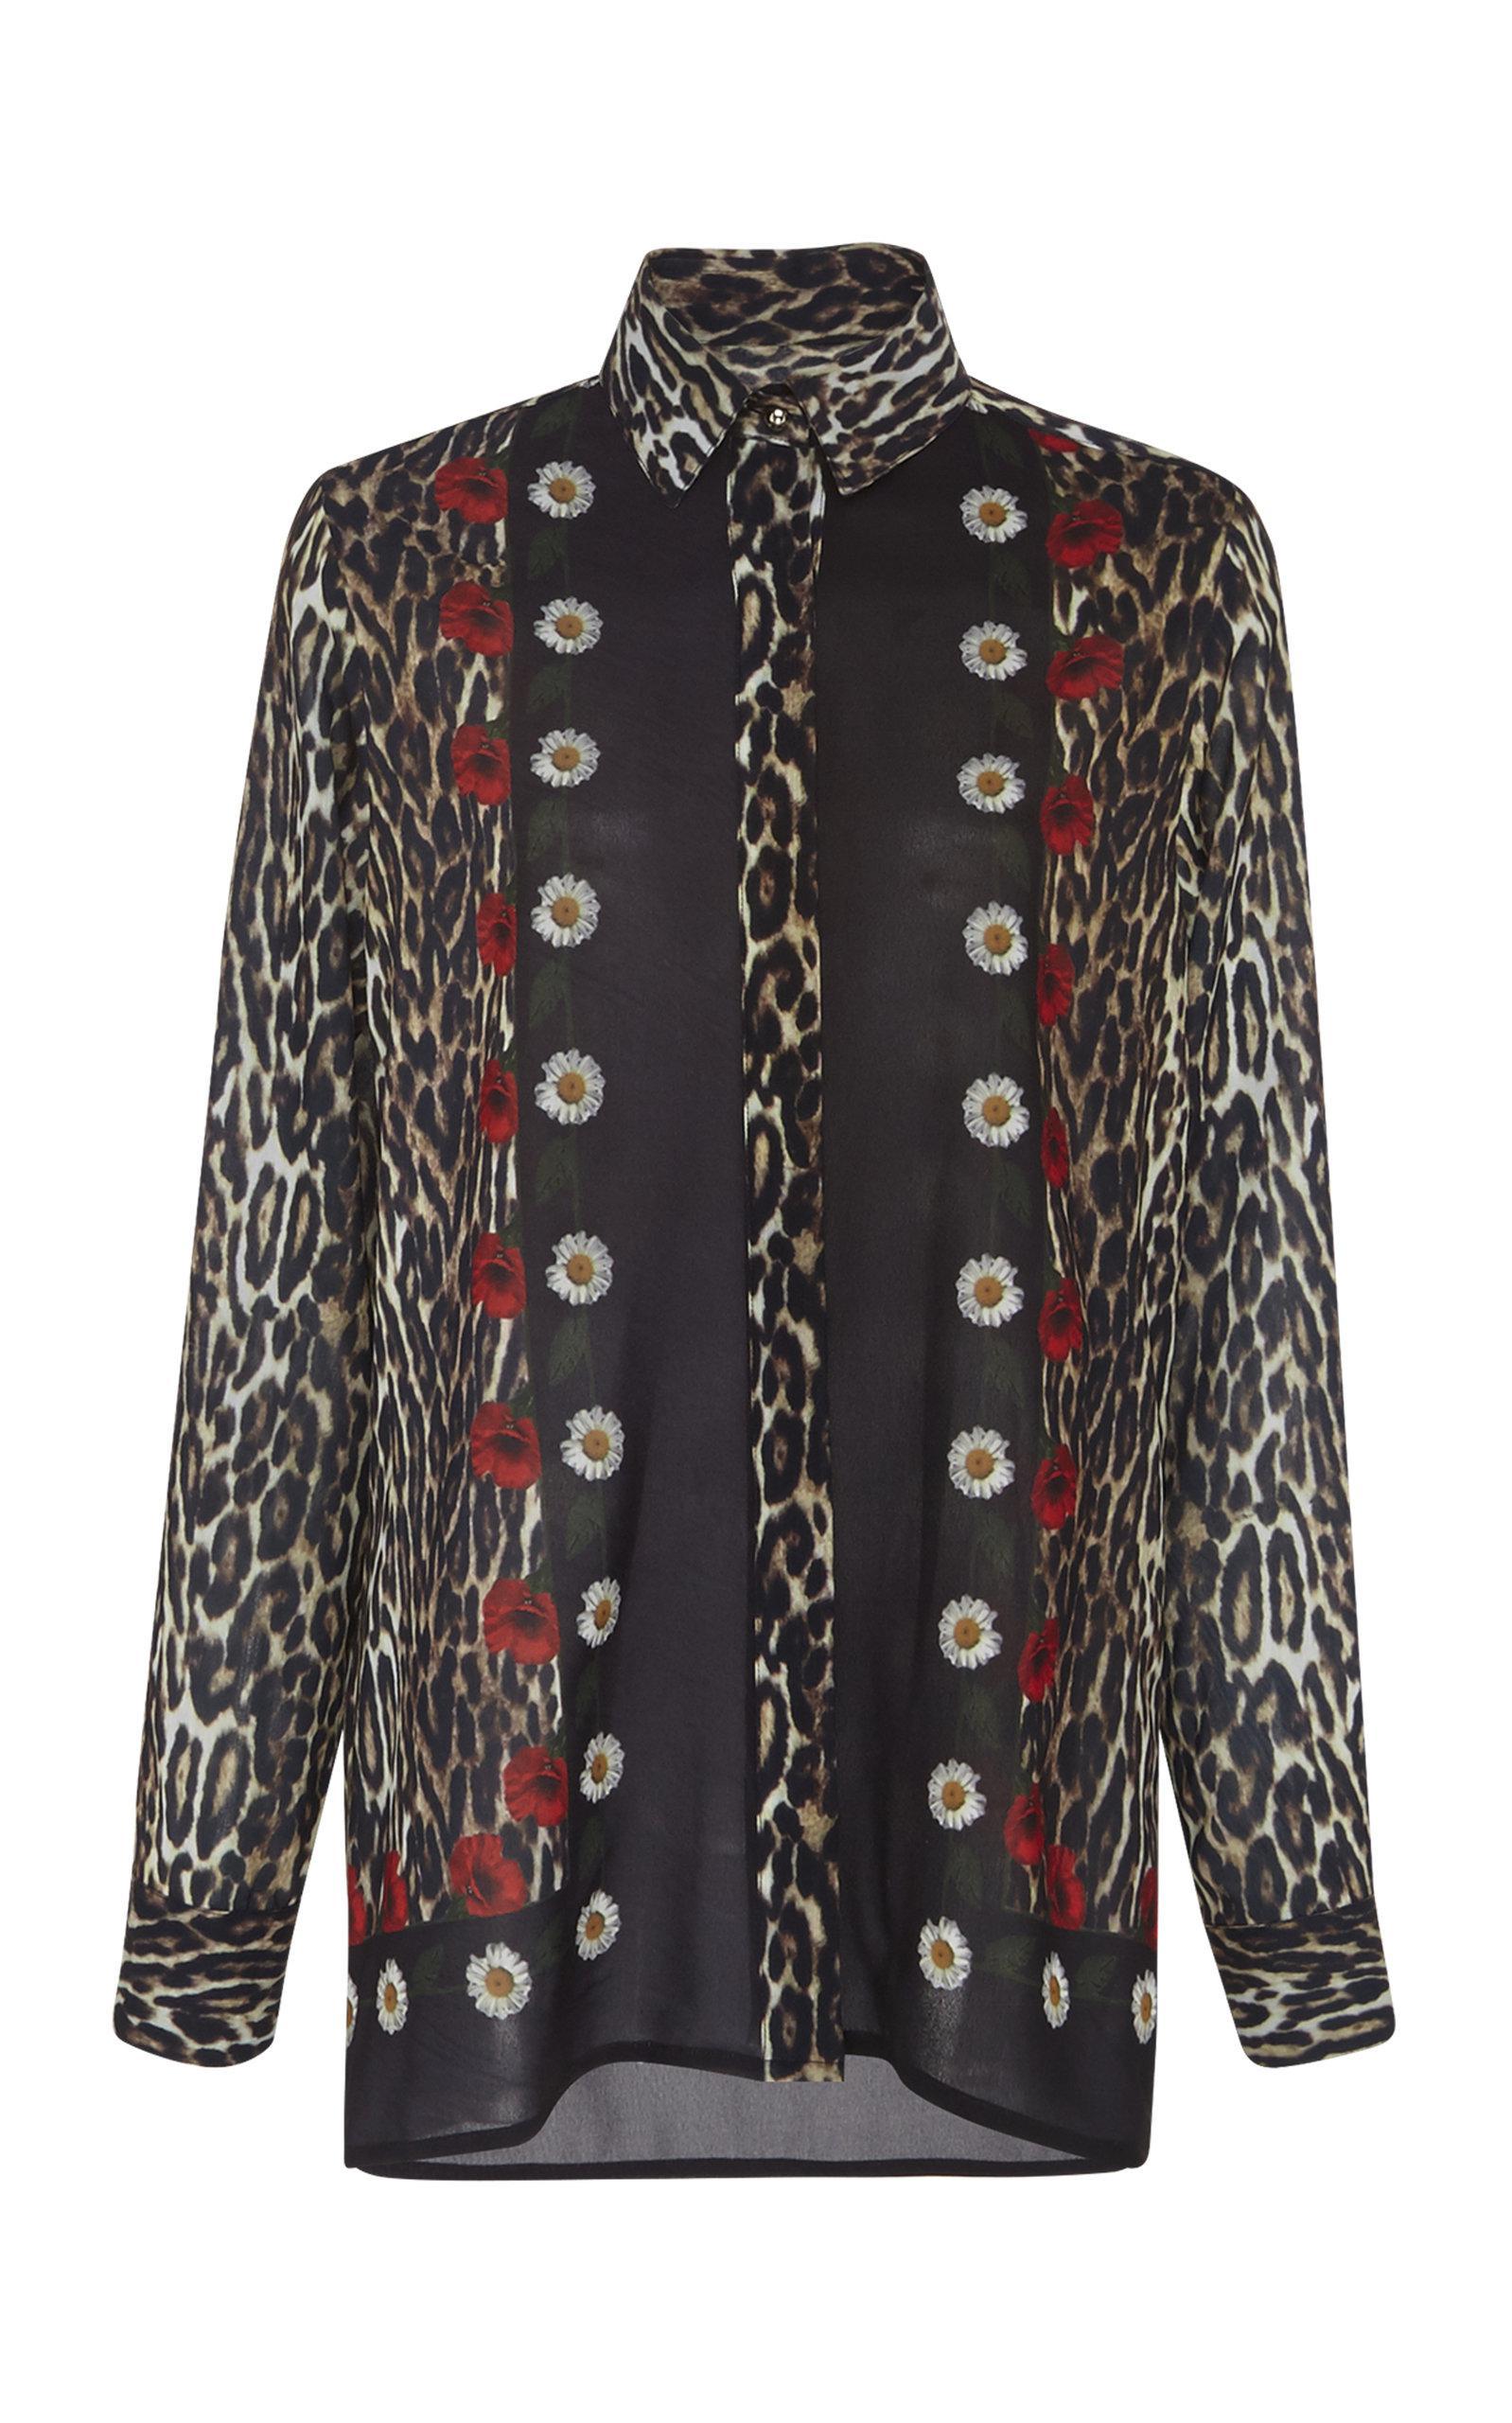 Printed Georgette shirt Elie Saab Buy Cheap Cost Cheap Sale Discounts bV8K0bRR